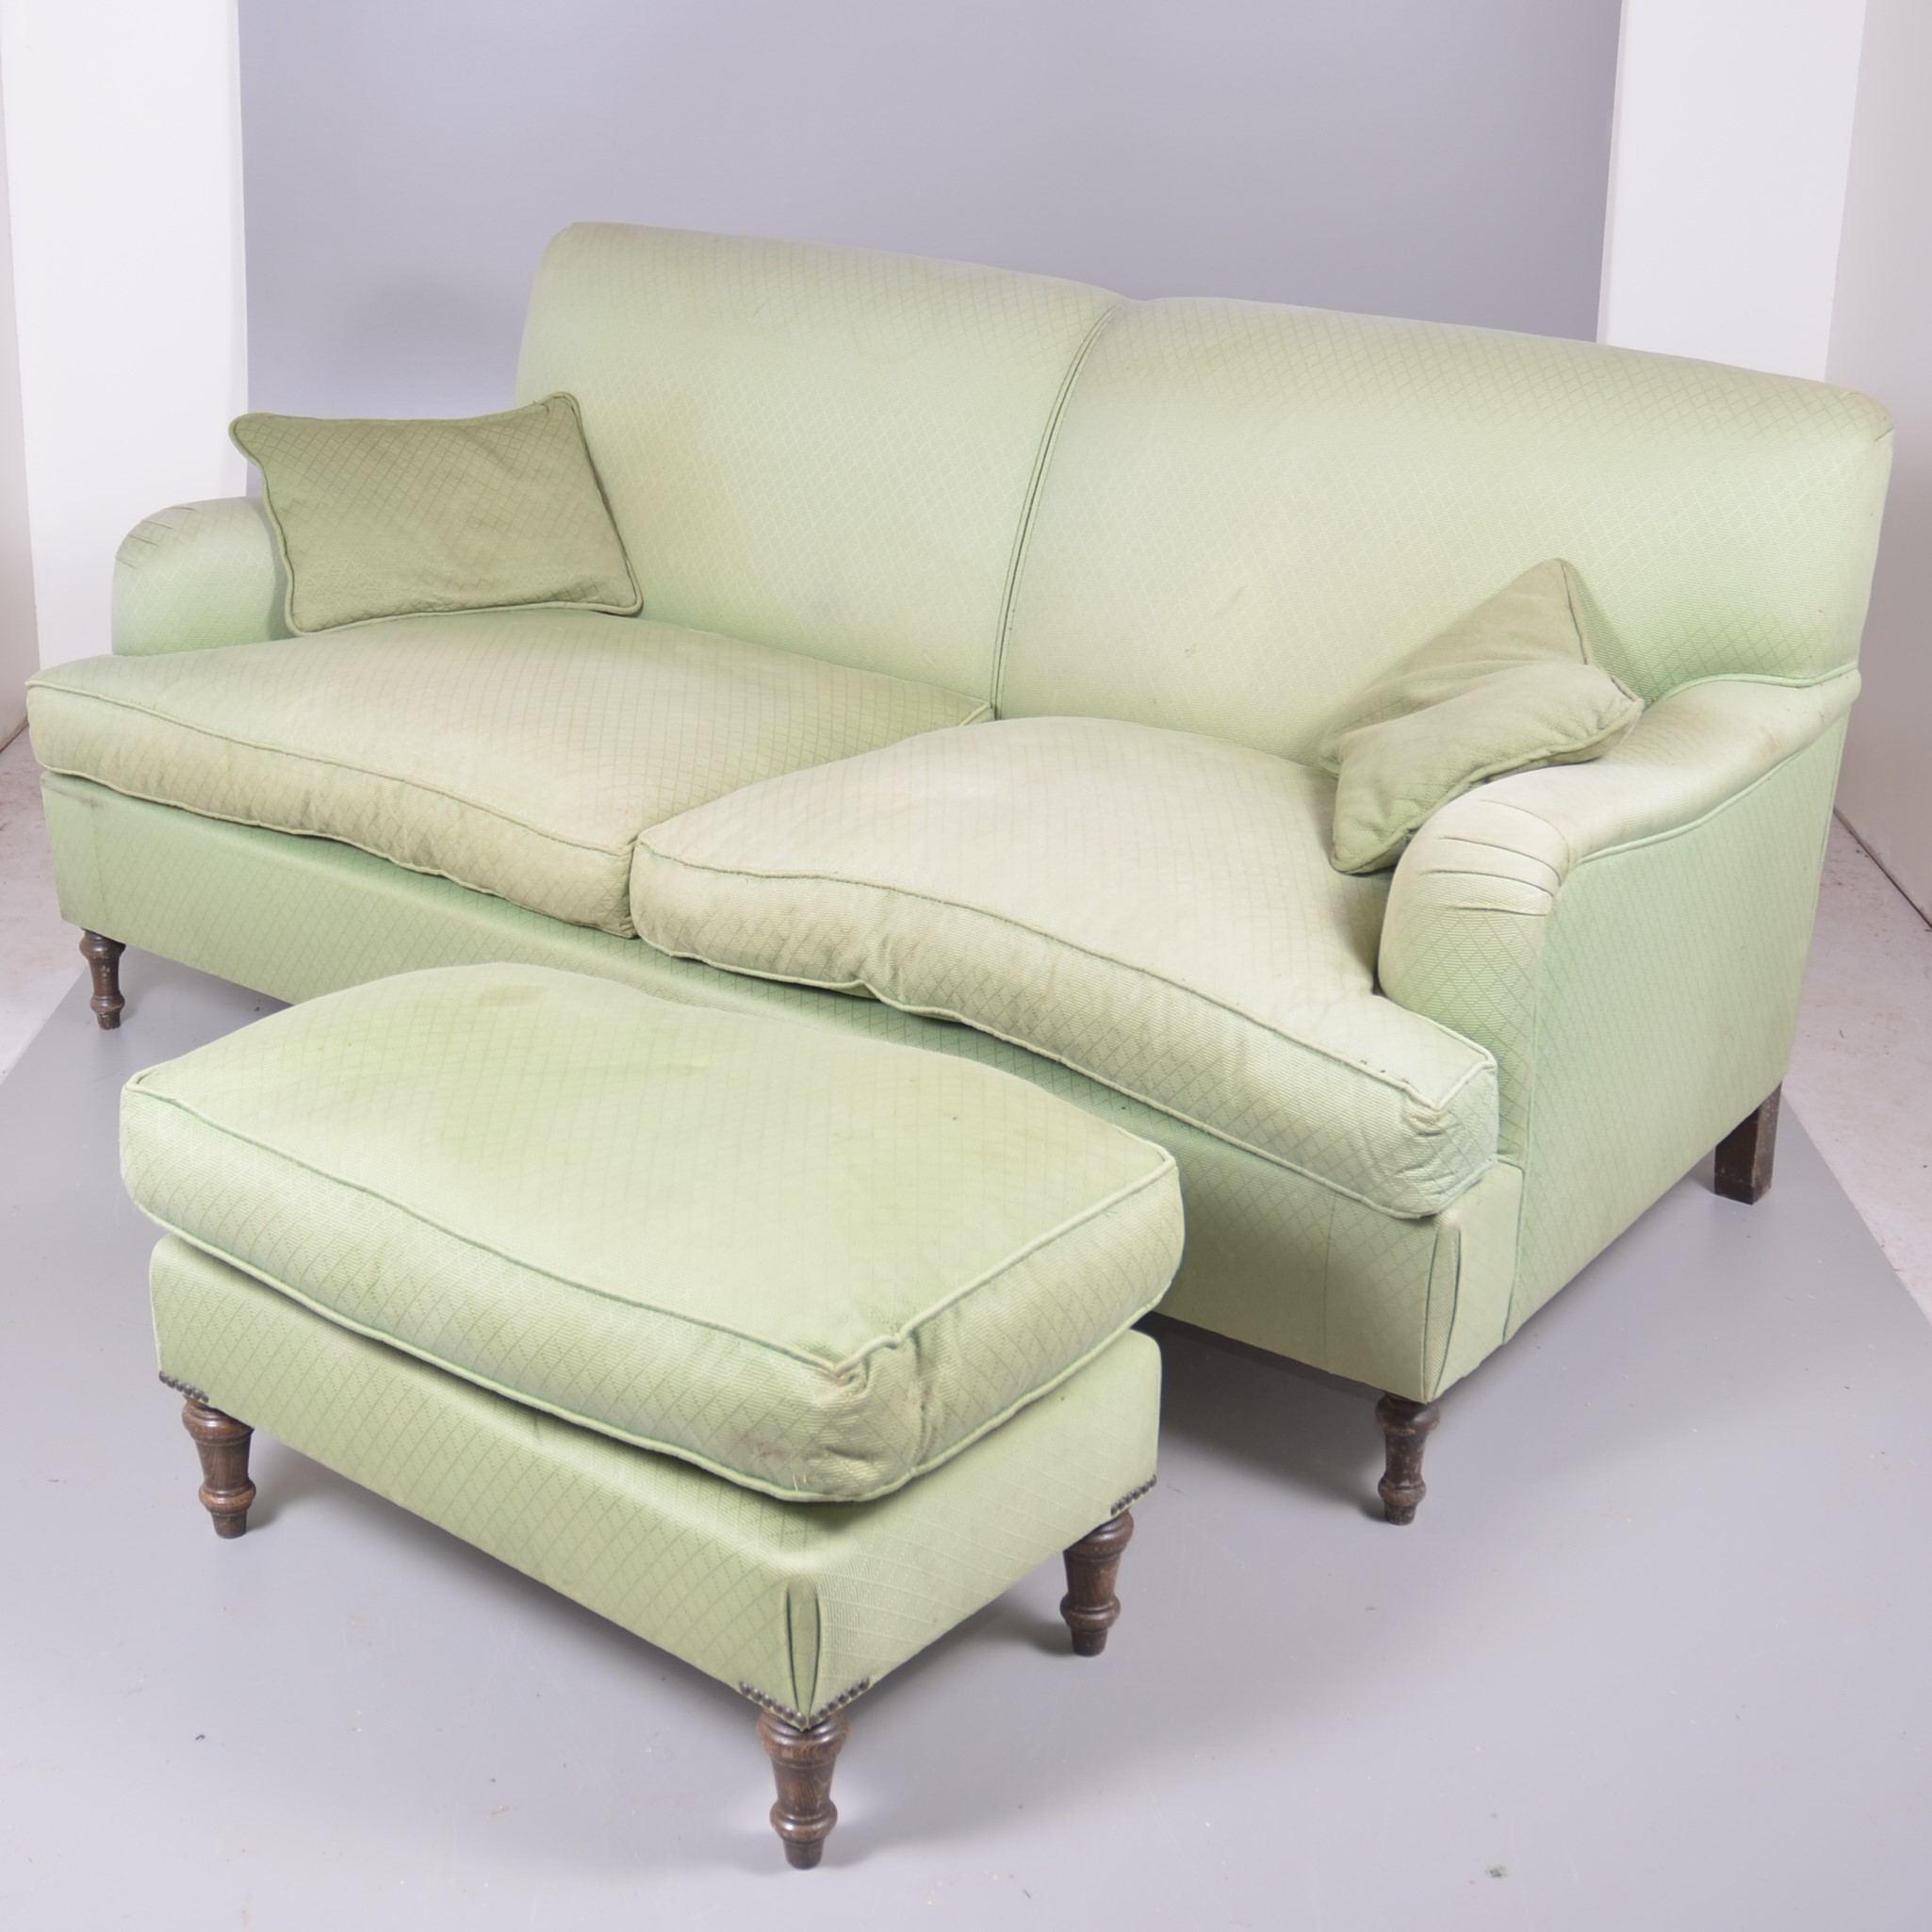 Underbar SOFFA, fotpall, KA International. Furniture - Sofas & seatings KH-28